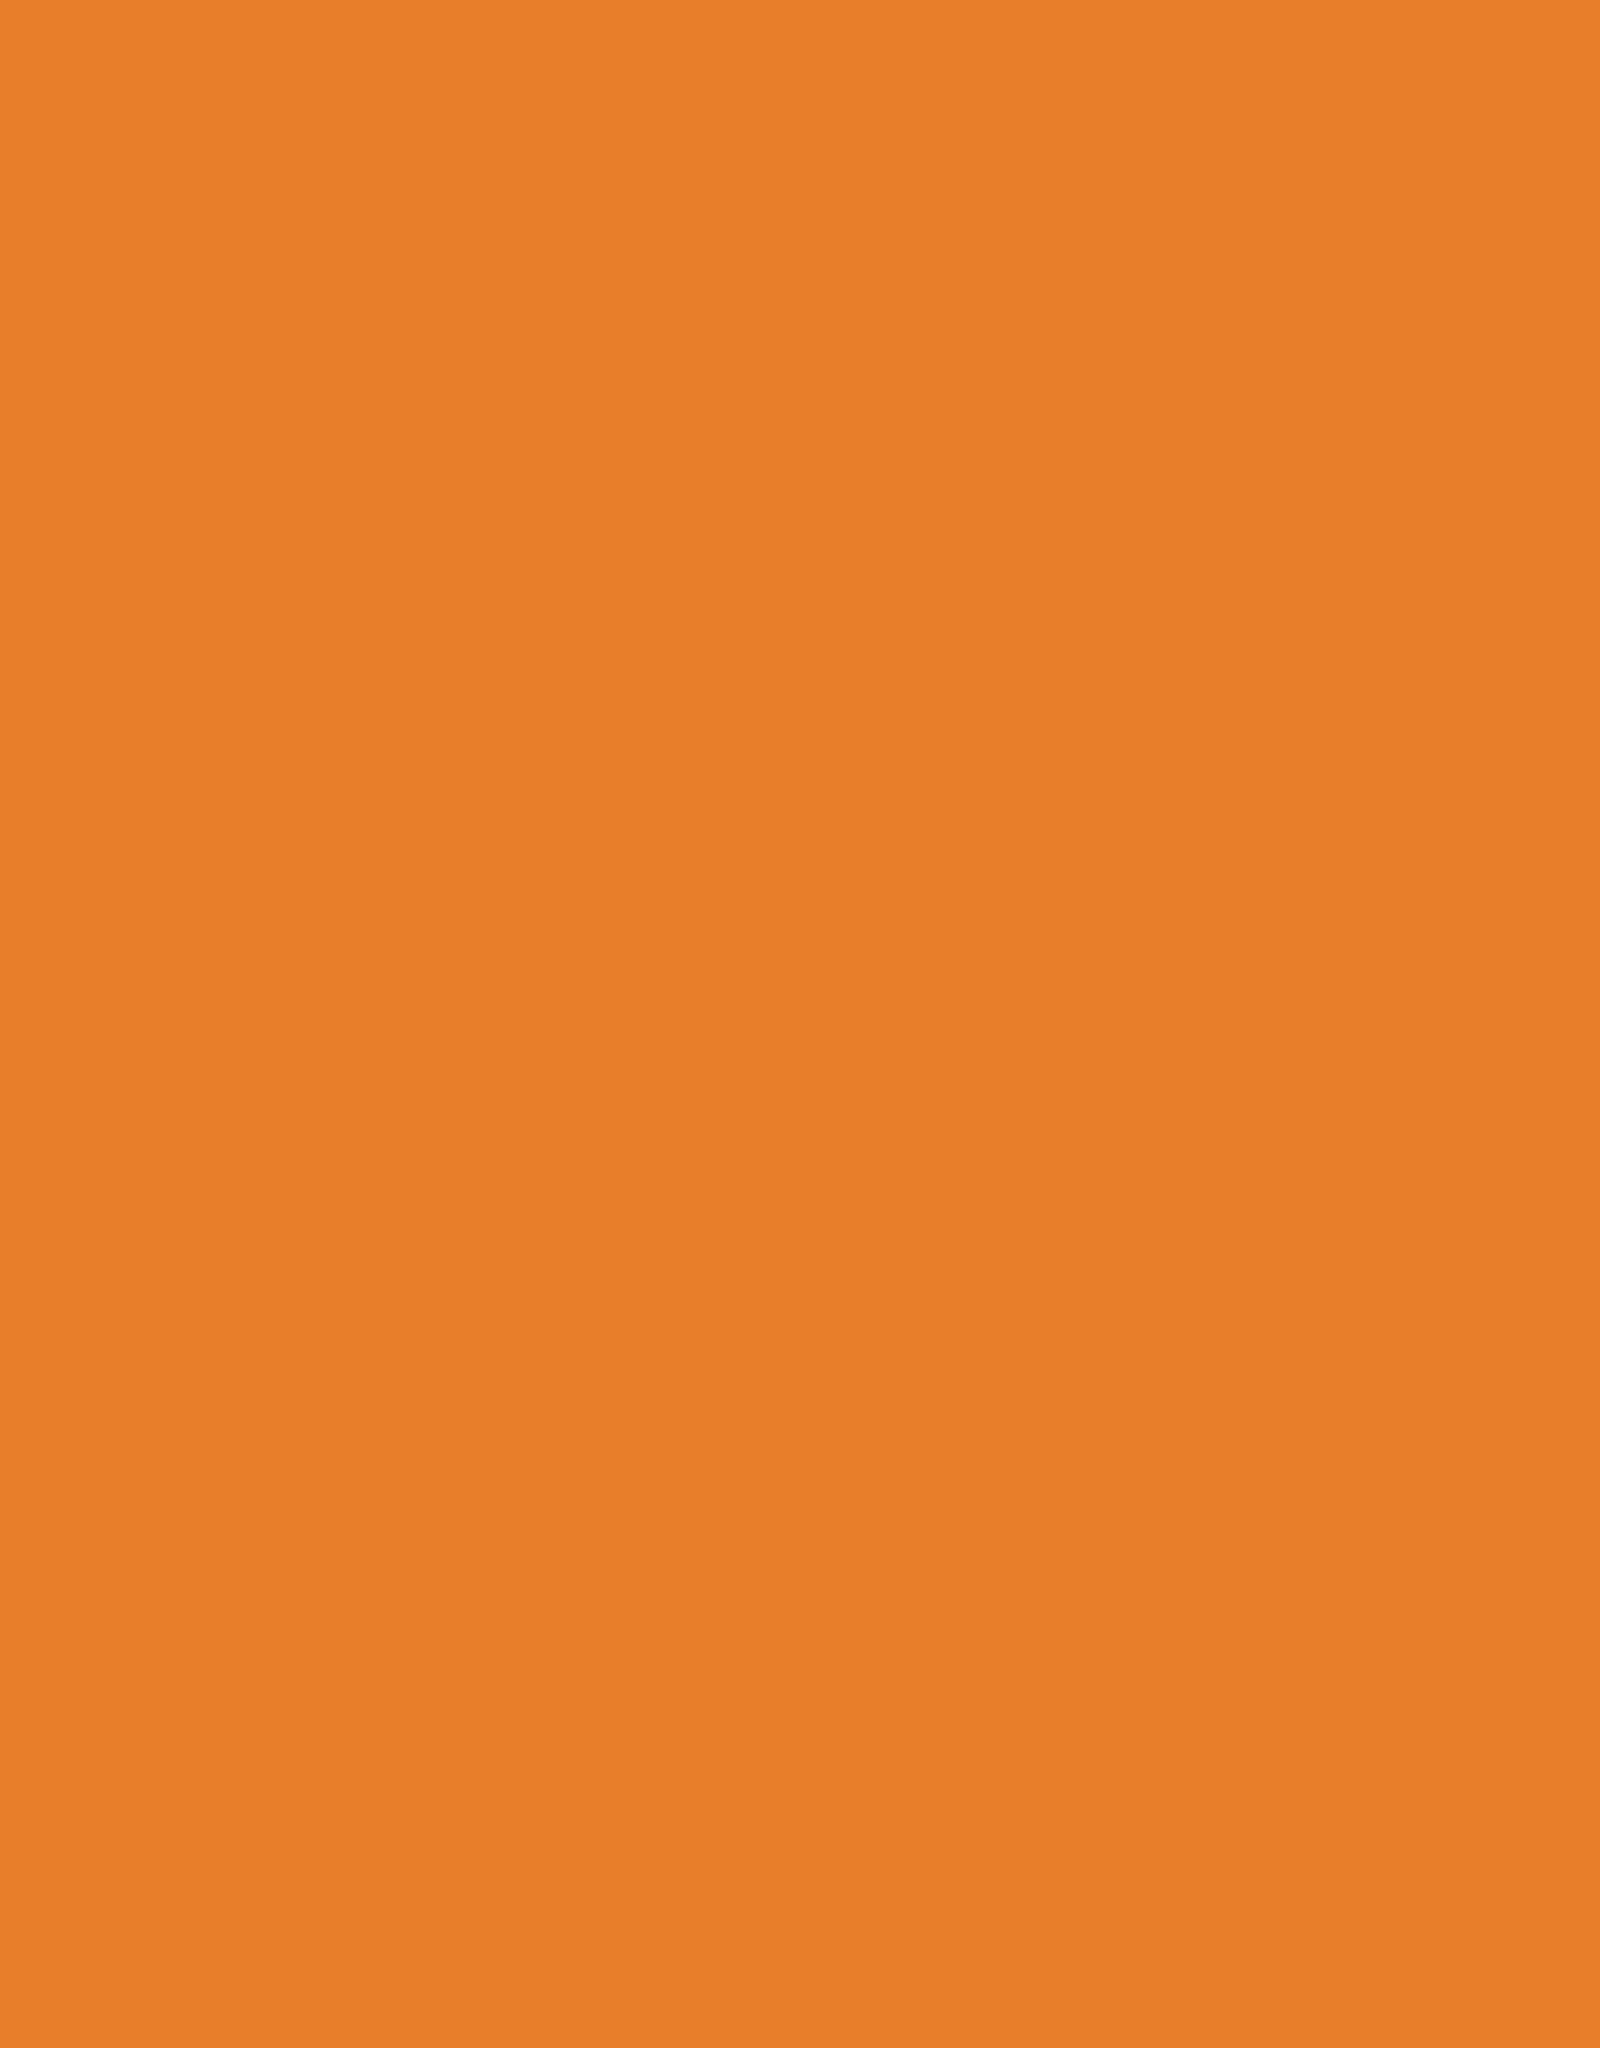 Sennelier, Egg Tempera, Cadmium Yellow Orange, Series 5, 21ml Tube